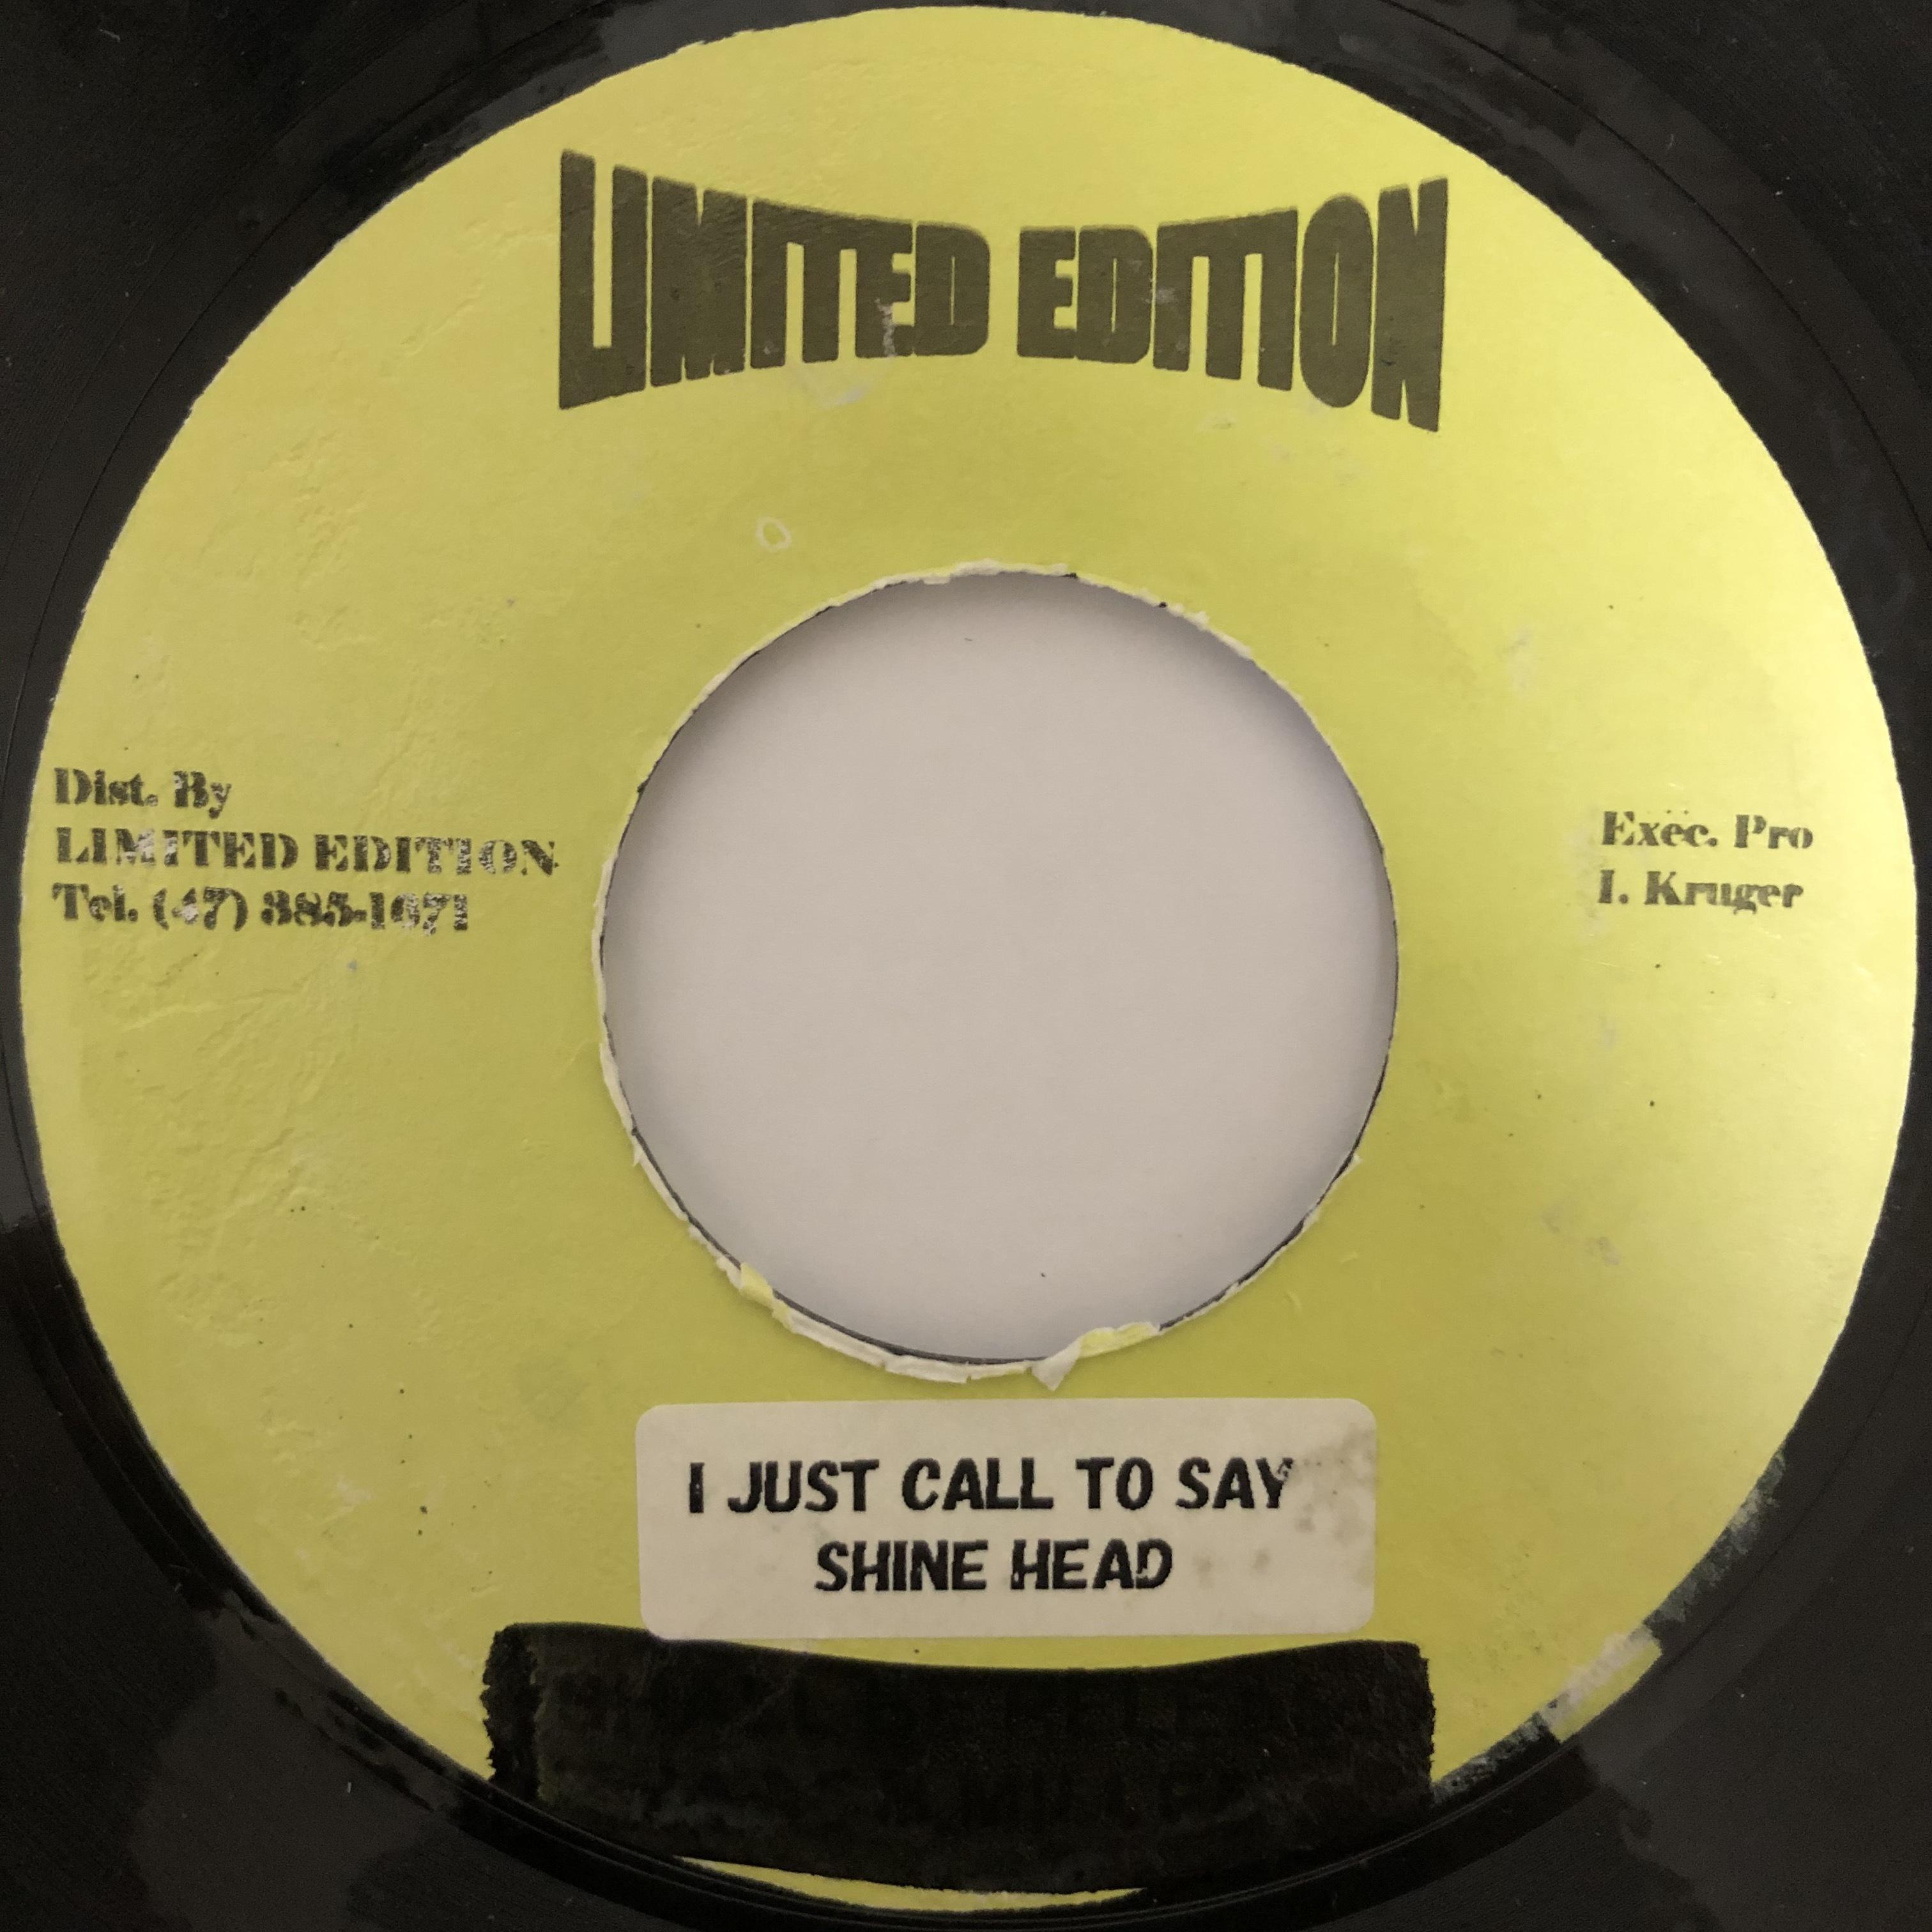 Shinehead - I Just Call To Say【7-20413】